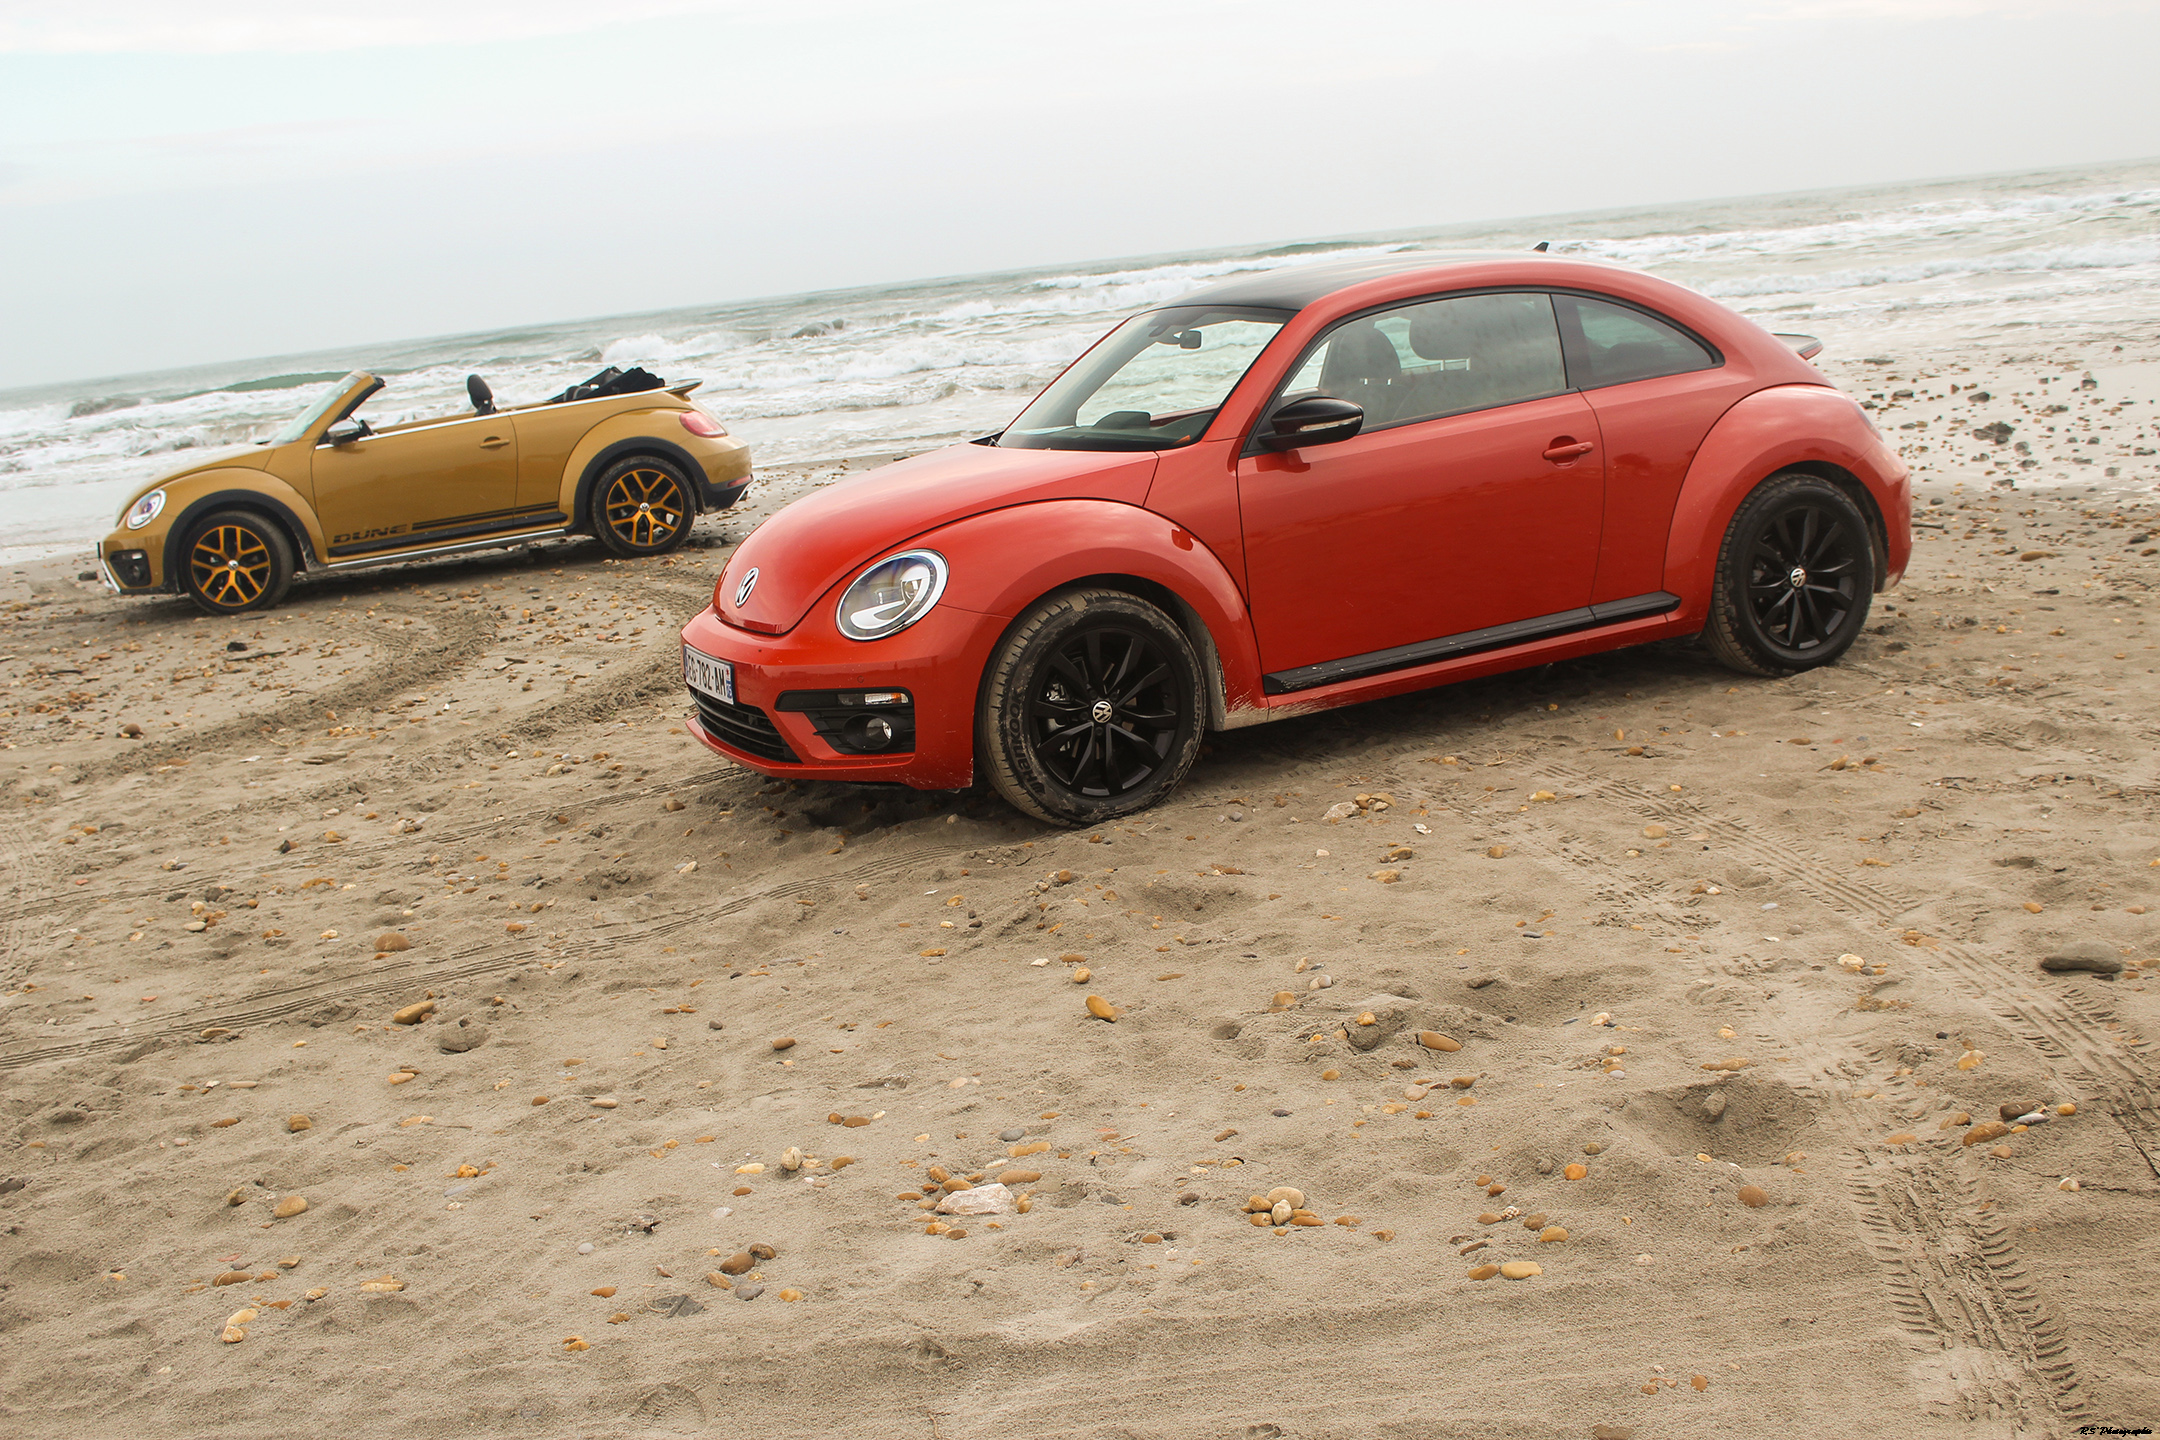 vwcox44-volkswagen-coccinelle-dune-cabriolet-design-profil-side-face-arnaud-demasier-rsphotographie